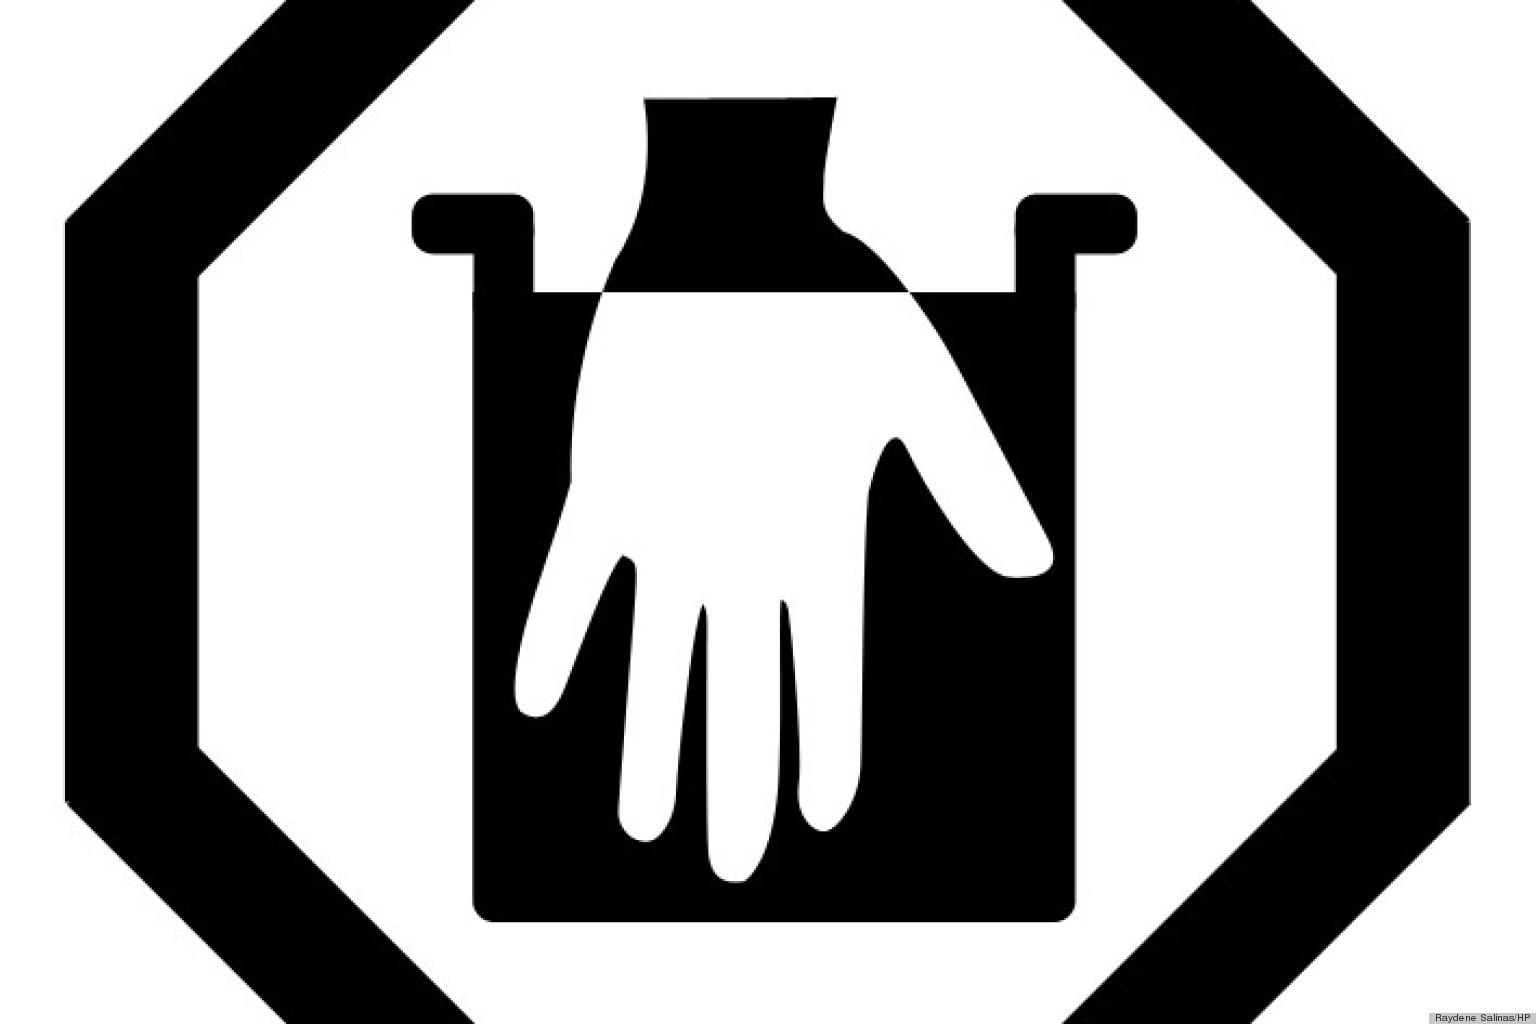 Hazard Symbols to Look Out